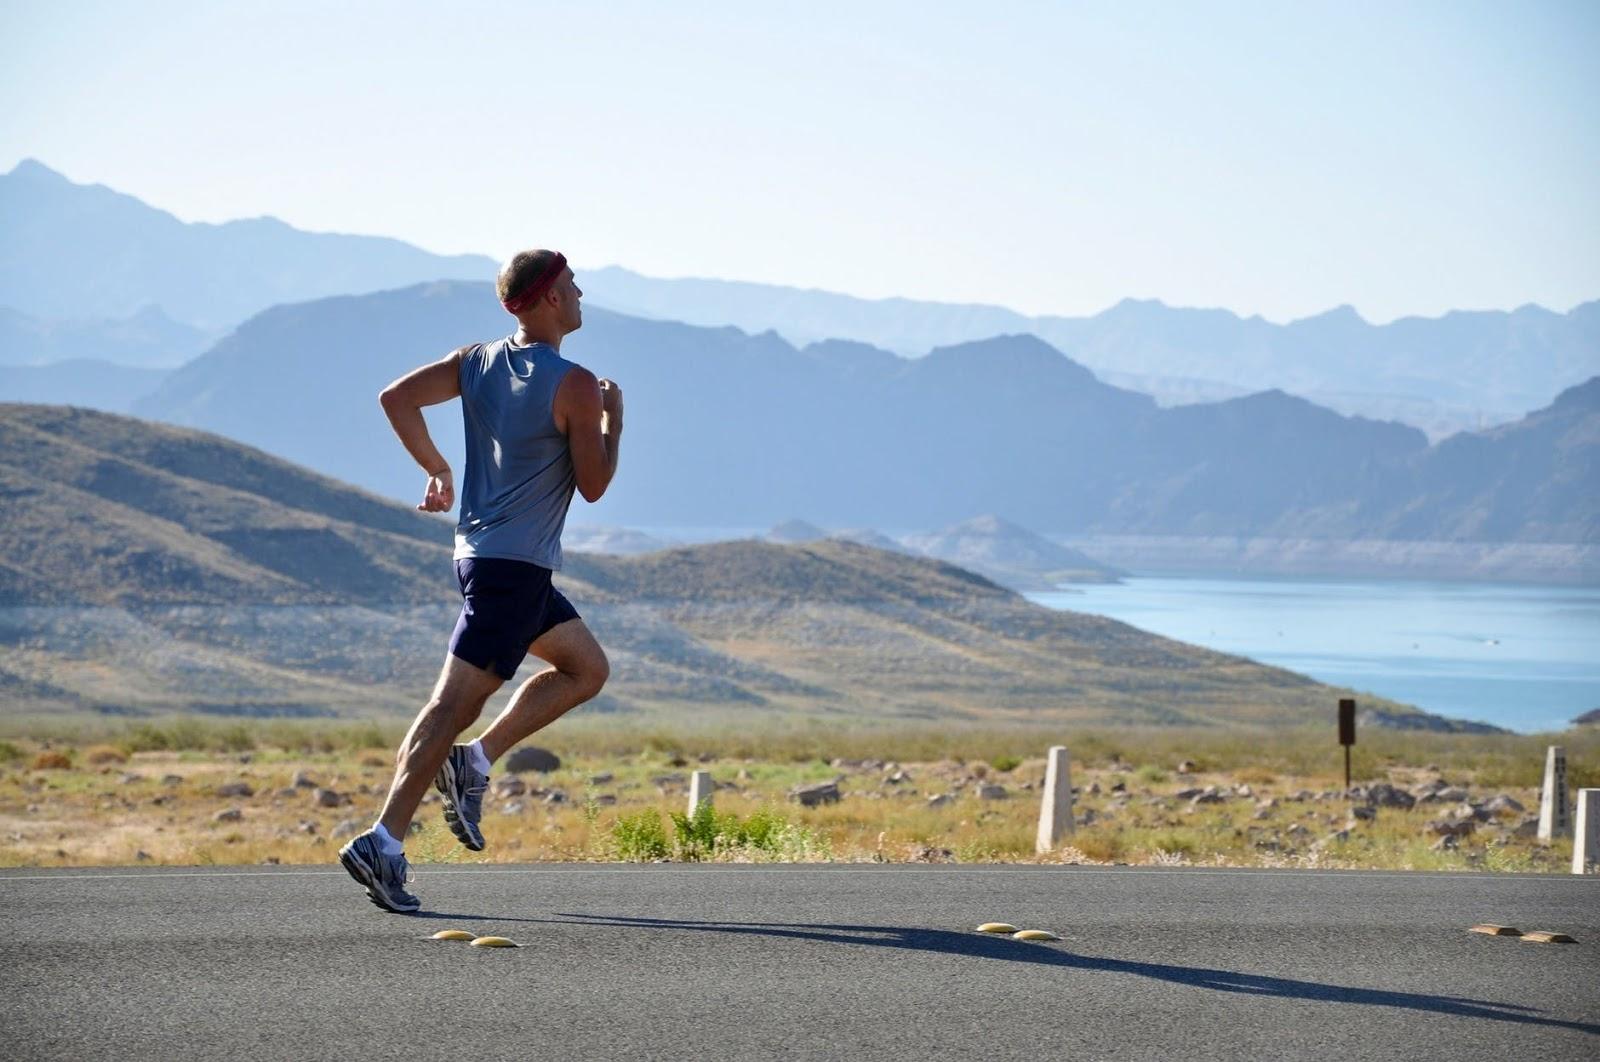 Manfaat Olahraga Untuk Orang yang Berpuasa